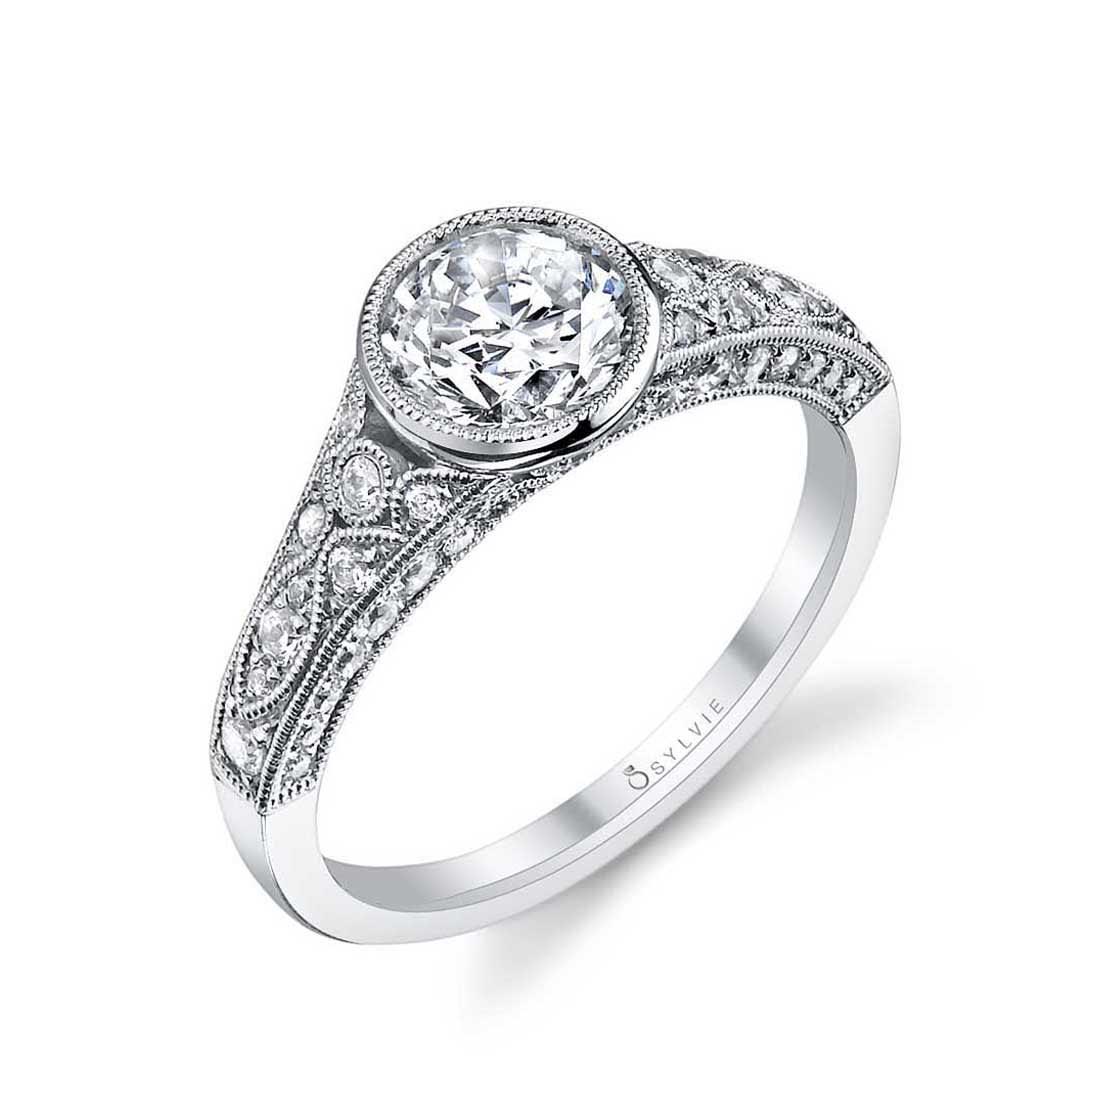 Barbara Vintage Bezel Set Diamond Engagement Ring Diamond Brokers Jewelry Of Los Altos